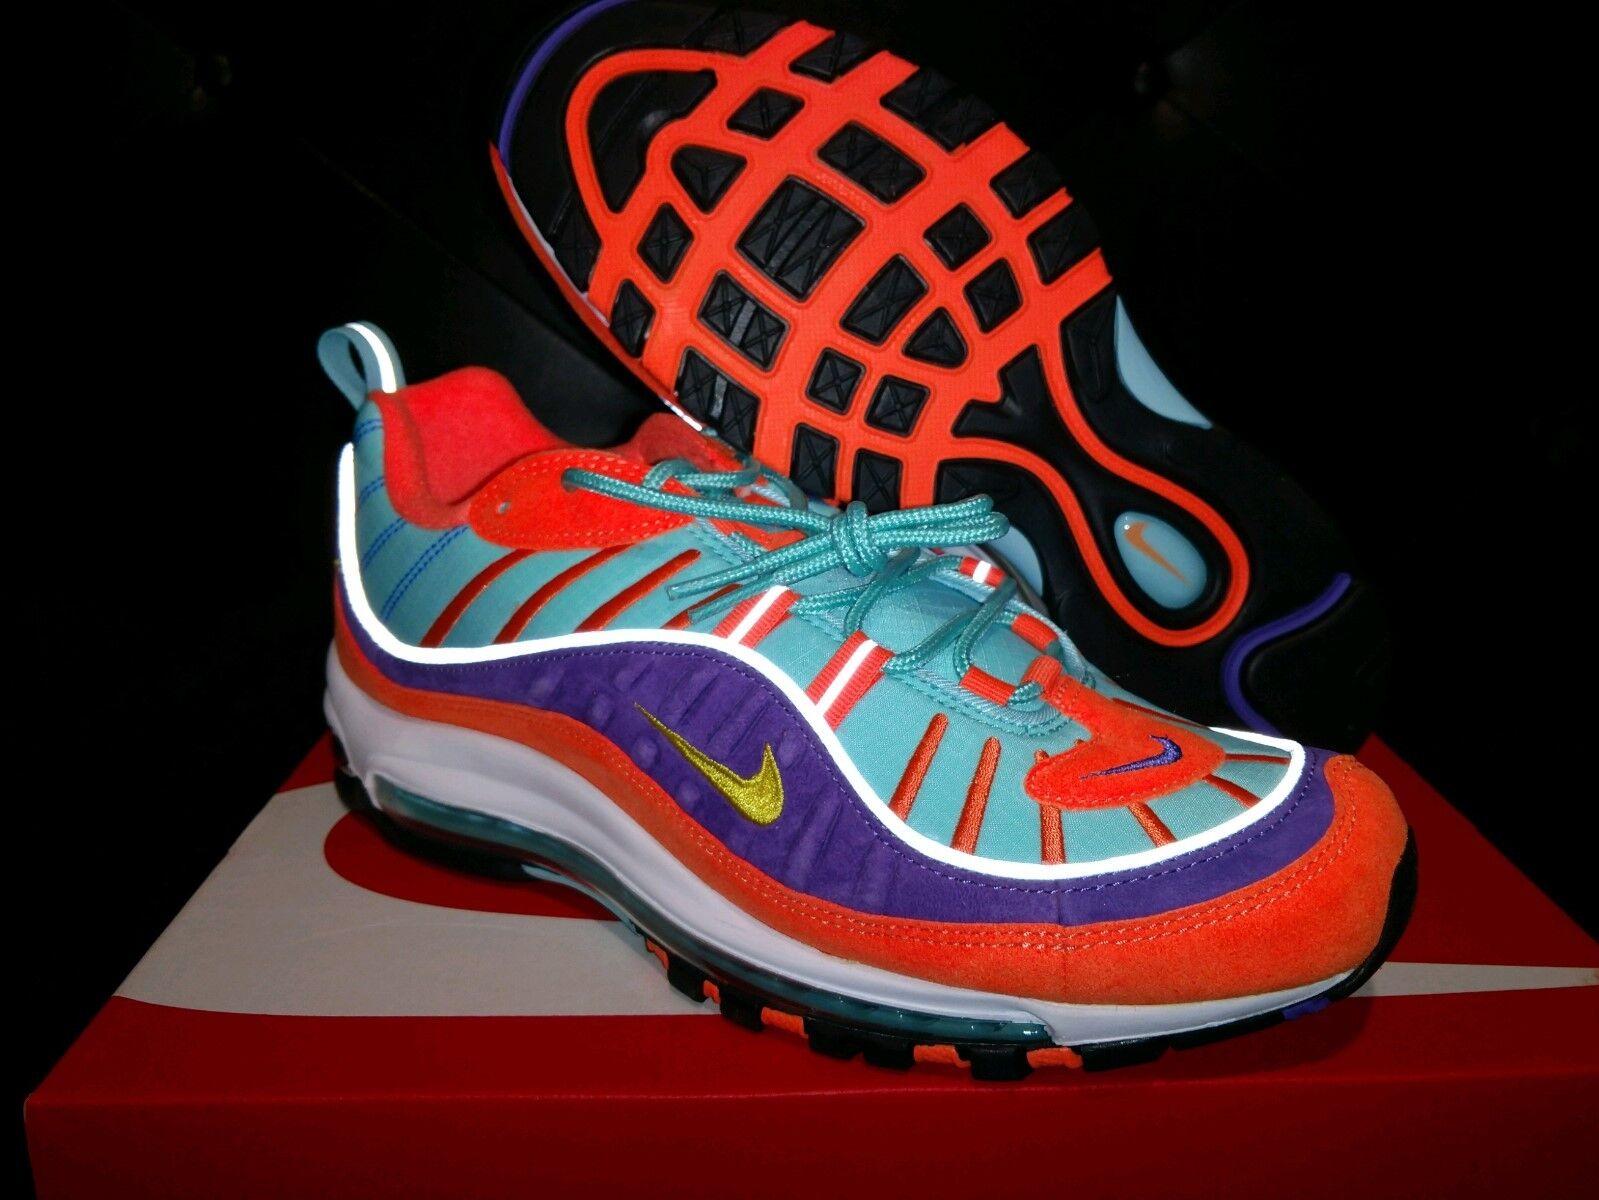 Nike Air Max 98 QS NIB Sz 9.5 Limited Edition Hyper/Purple